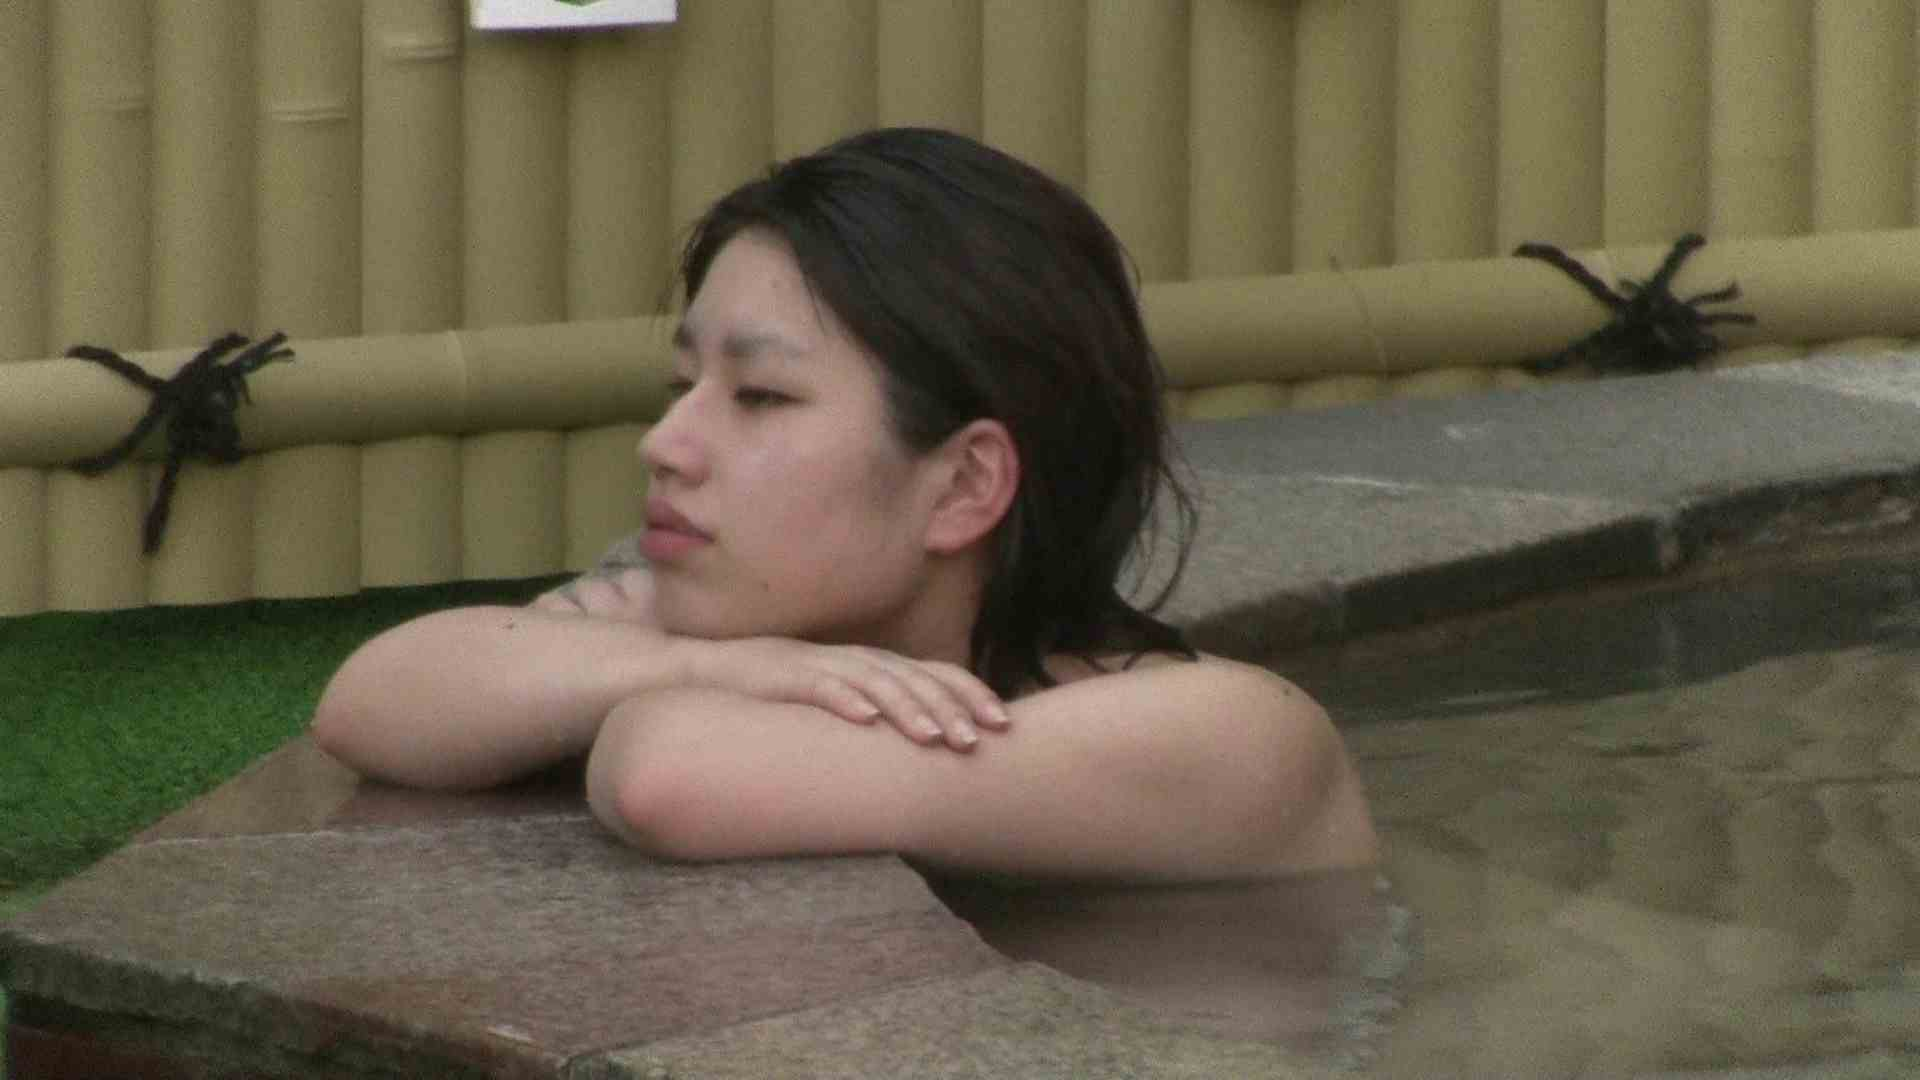 Aquaな露天風呂Vol.230 HなOL | 盗撮  83pic 23